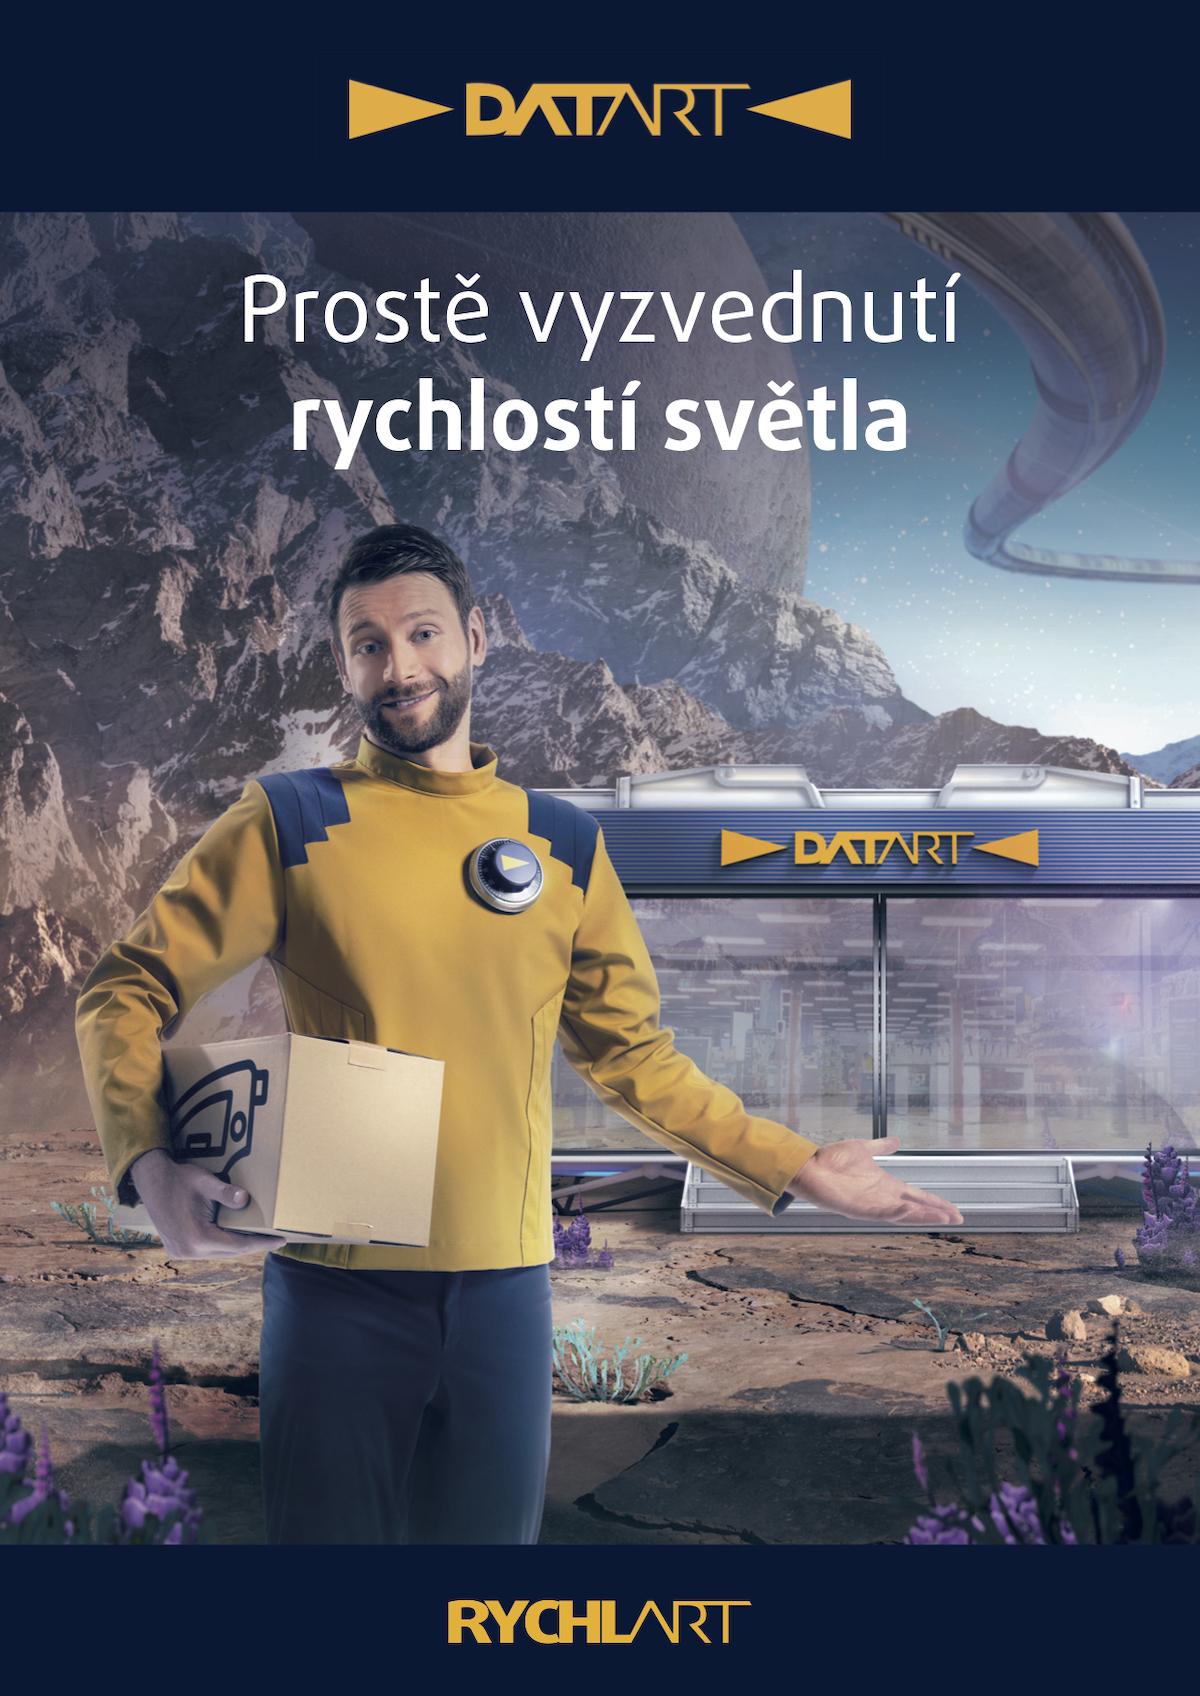 Datart: Rychlart (WMC Grey)